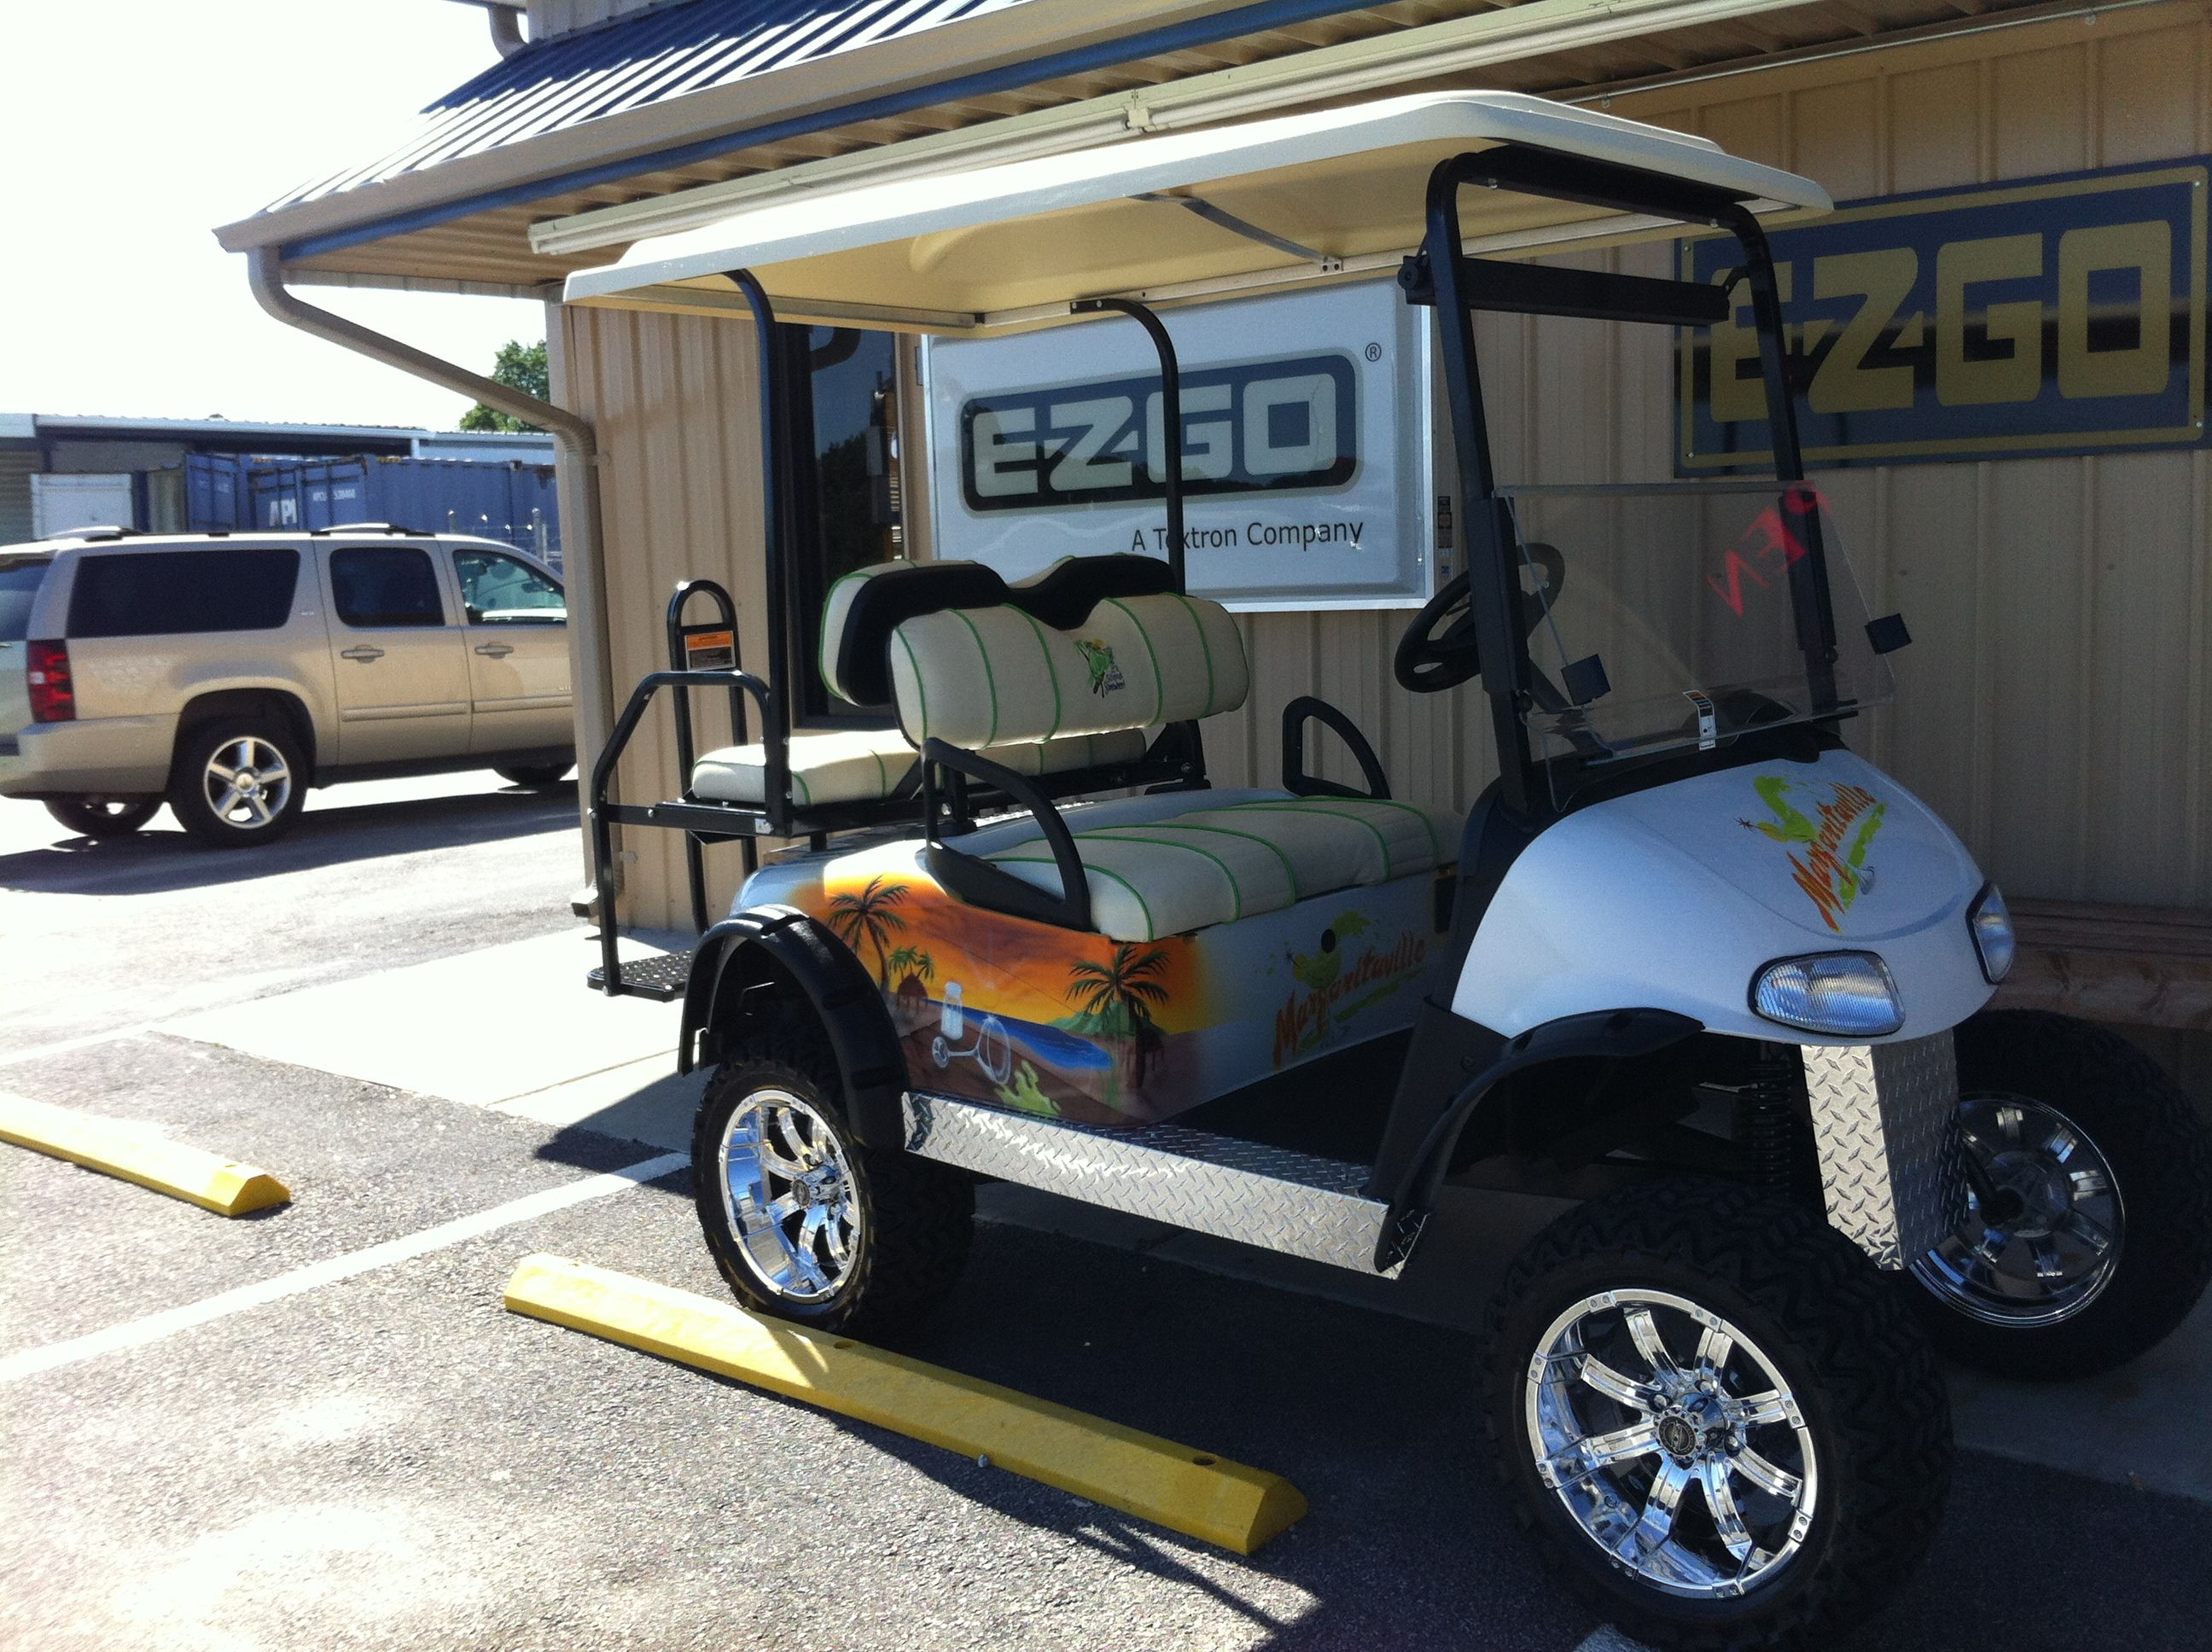 Golf Carts, Golf Carts for sale on RacingJunk Classifieds ...  |Margaritaville Golf Cart Craigslist